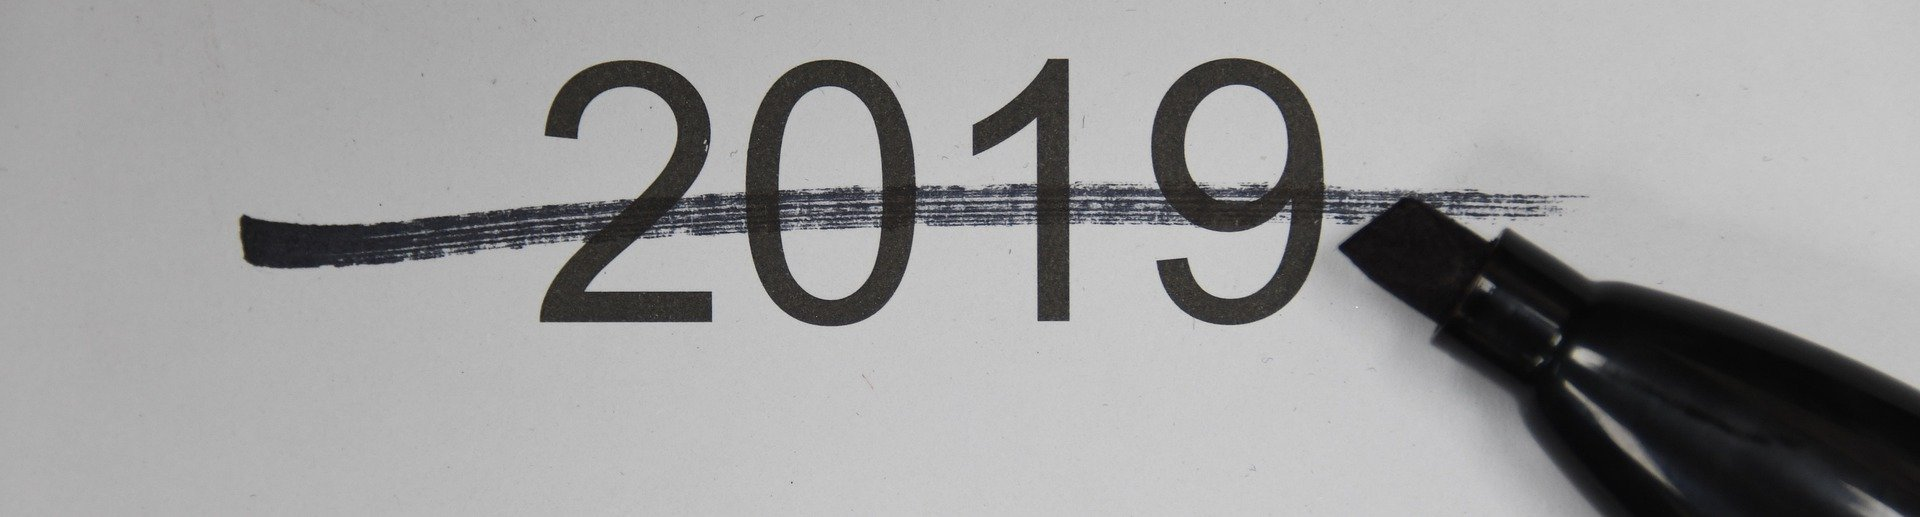 year-4720868_1920